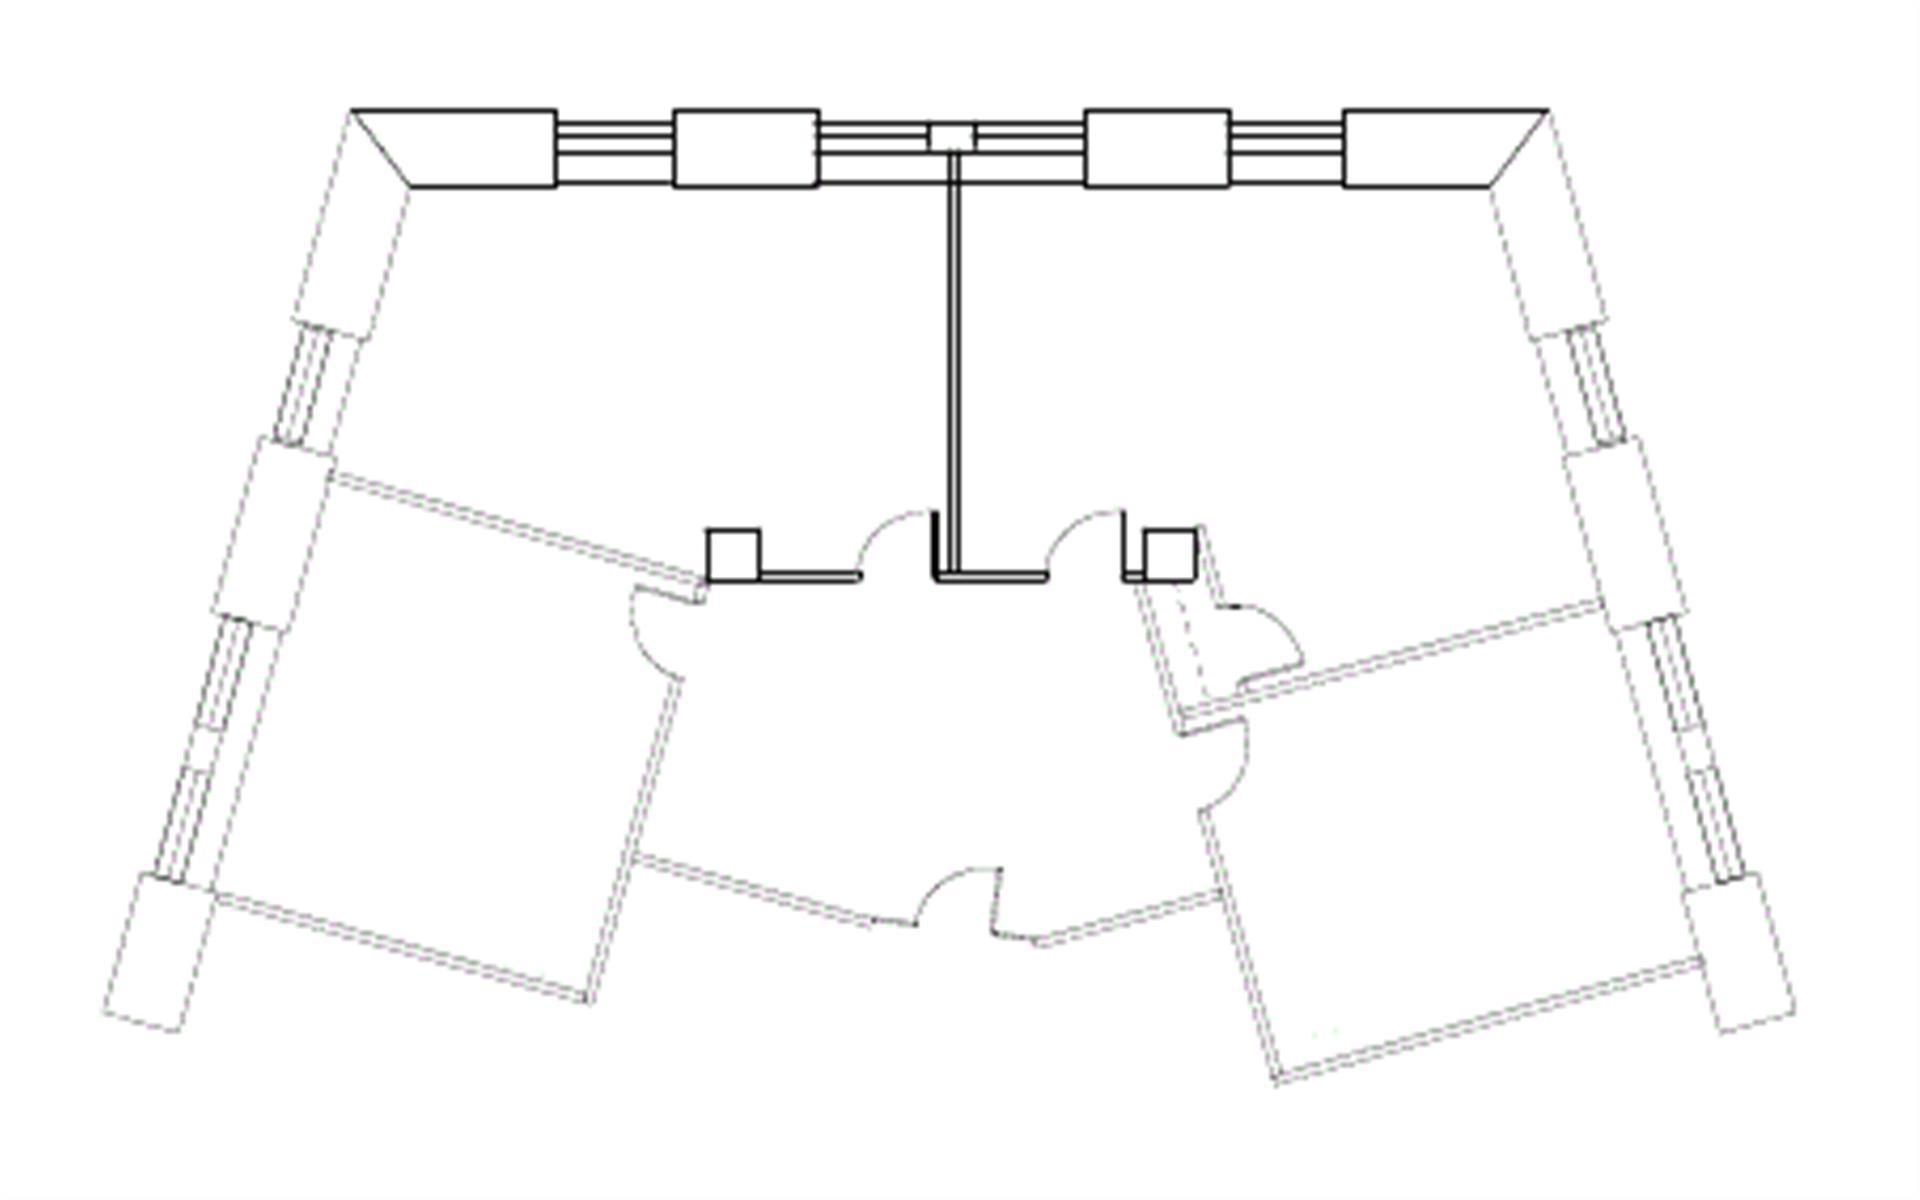 Boxer - The Hurt Building - Team Office | Suite 1400